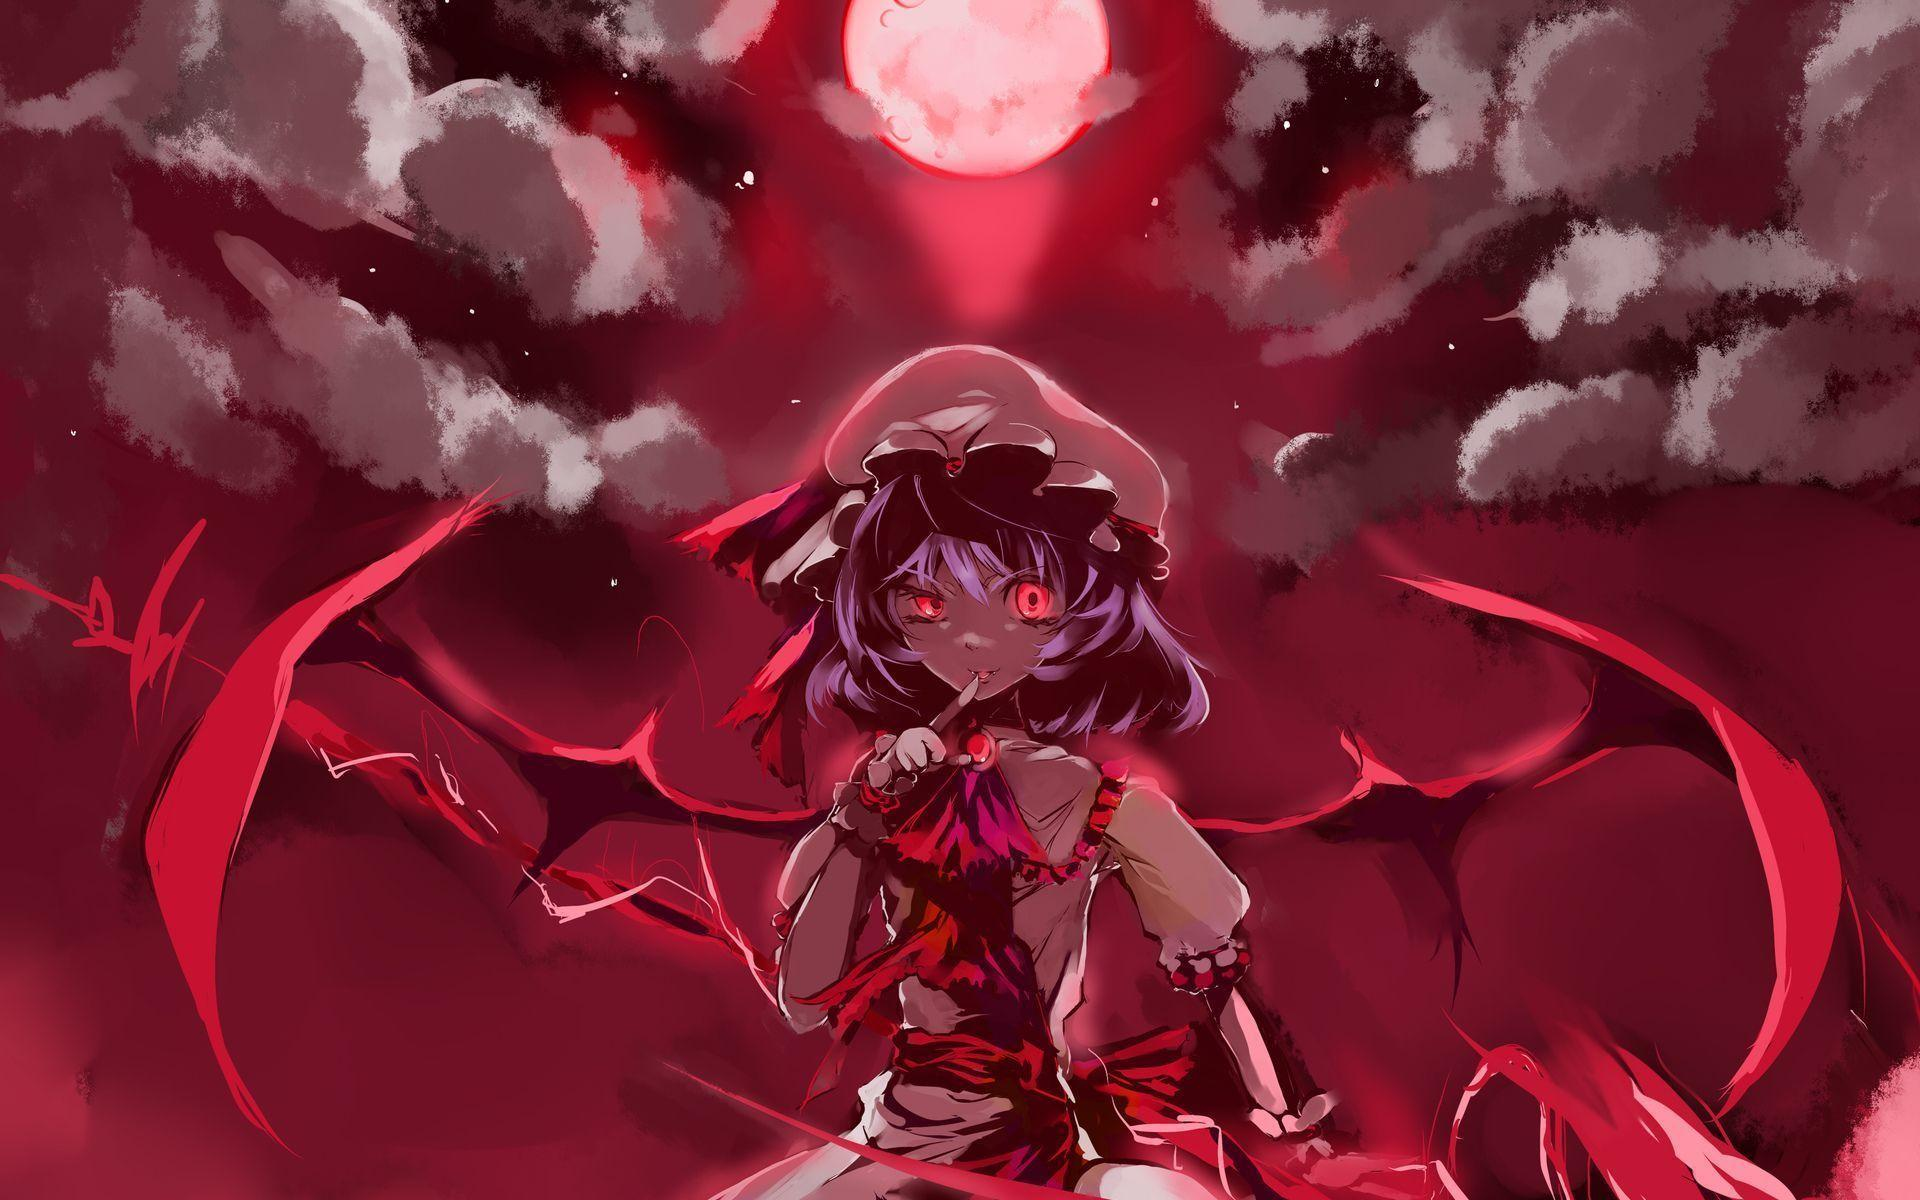 Anime vampire girl wallpaper id 1064 frenzia